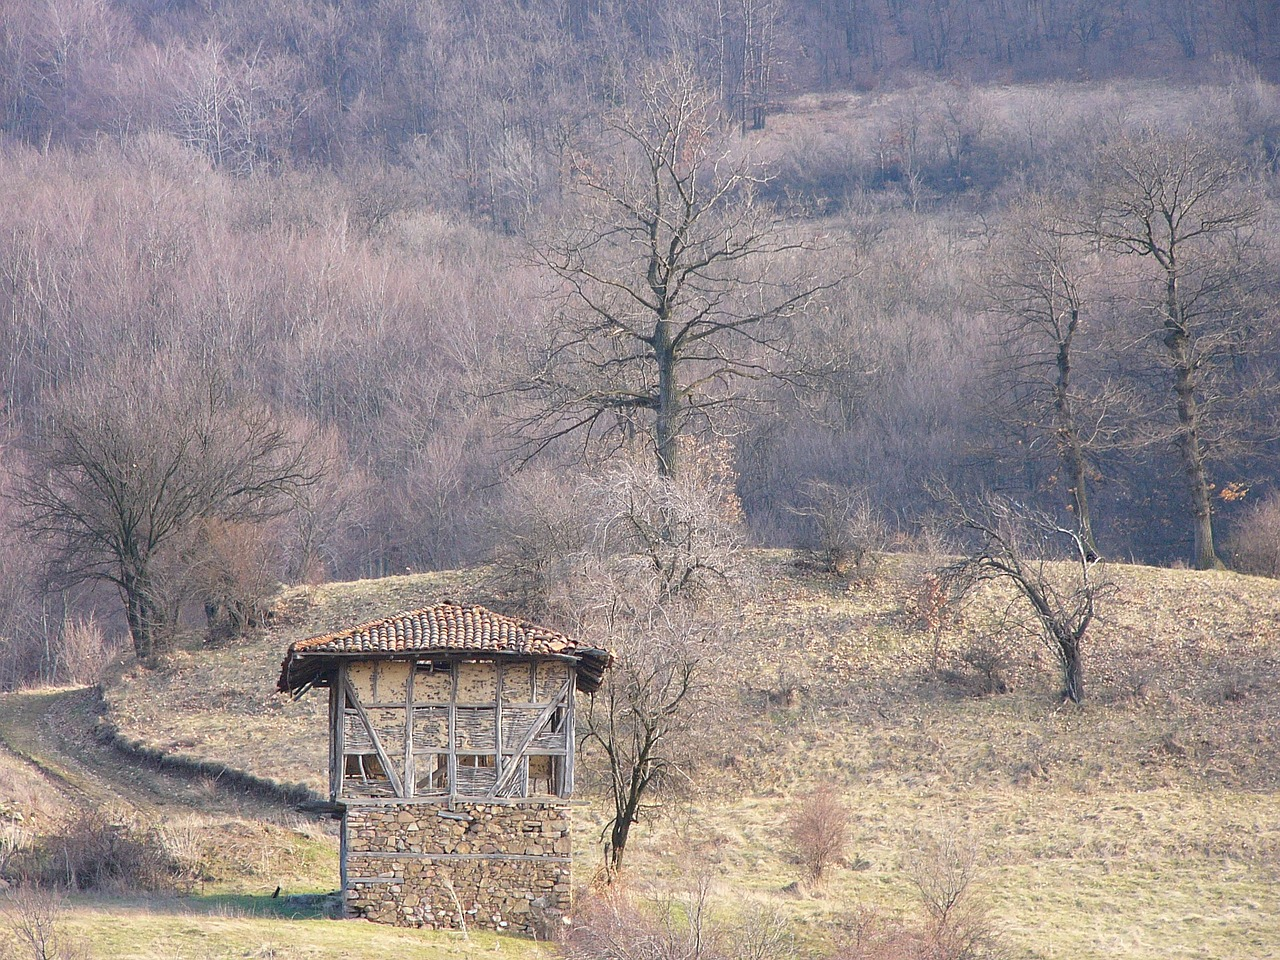 bulgaria-1064159_1280